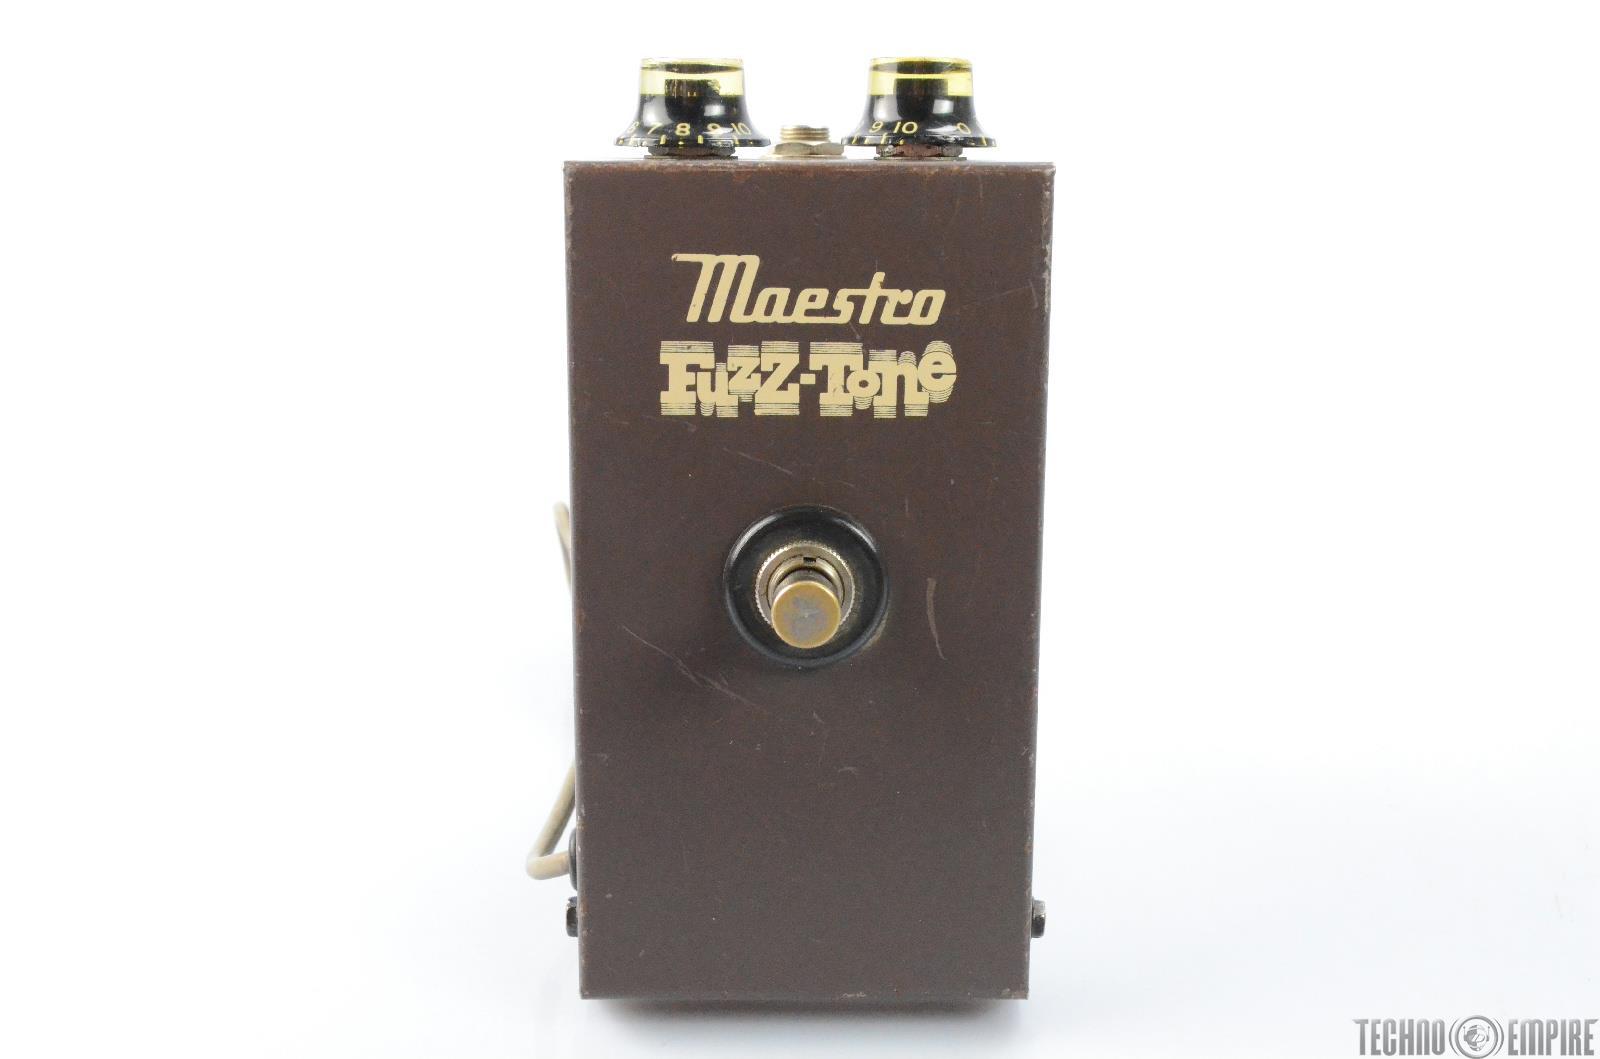 1960's Gibson Maestro Fuzz-Tone FZ-1A Guitar Pedal Fairfax Recording #27854